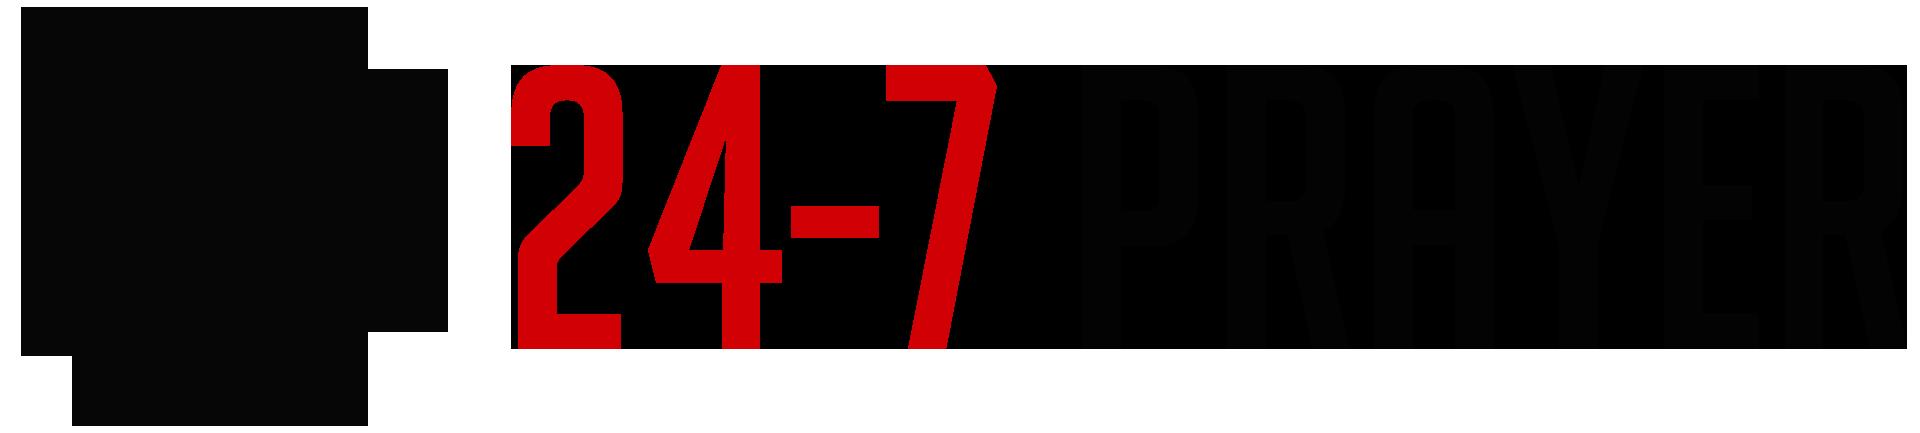 24-7 prayer - Copy